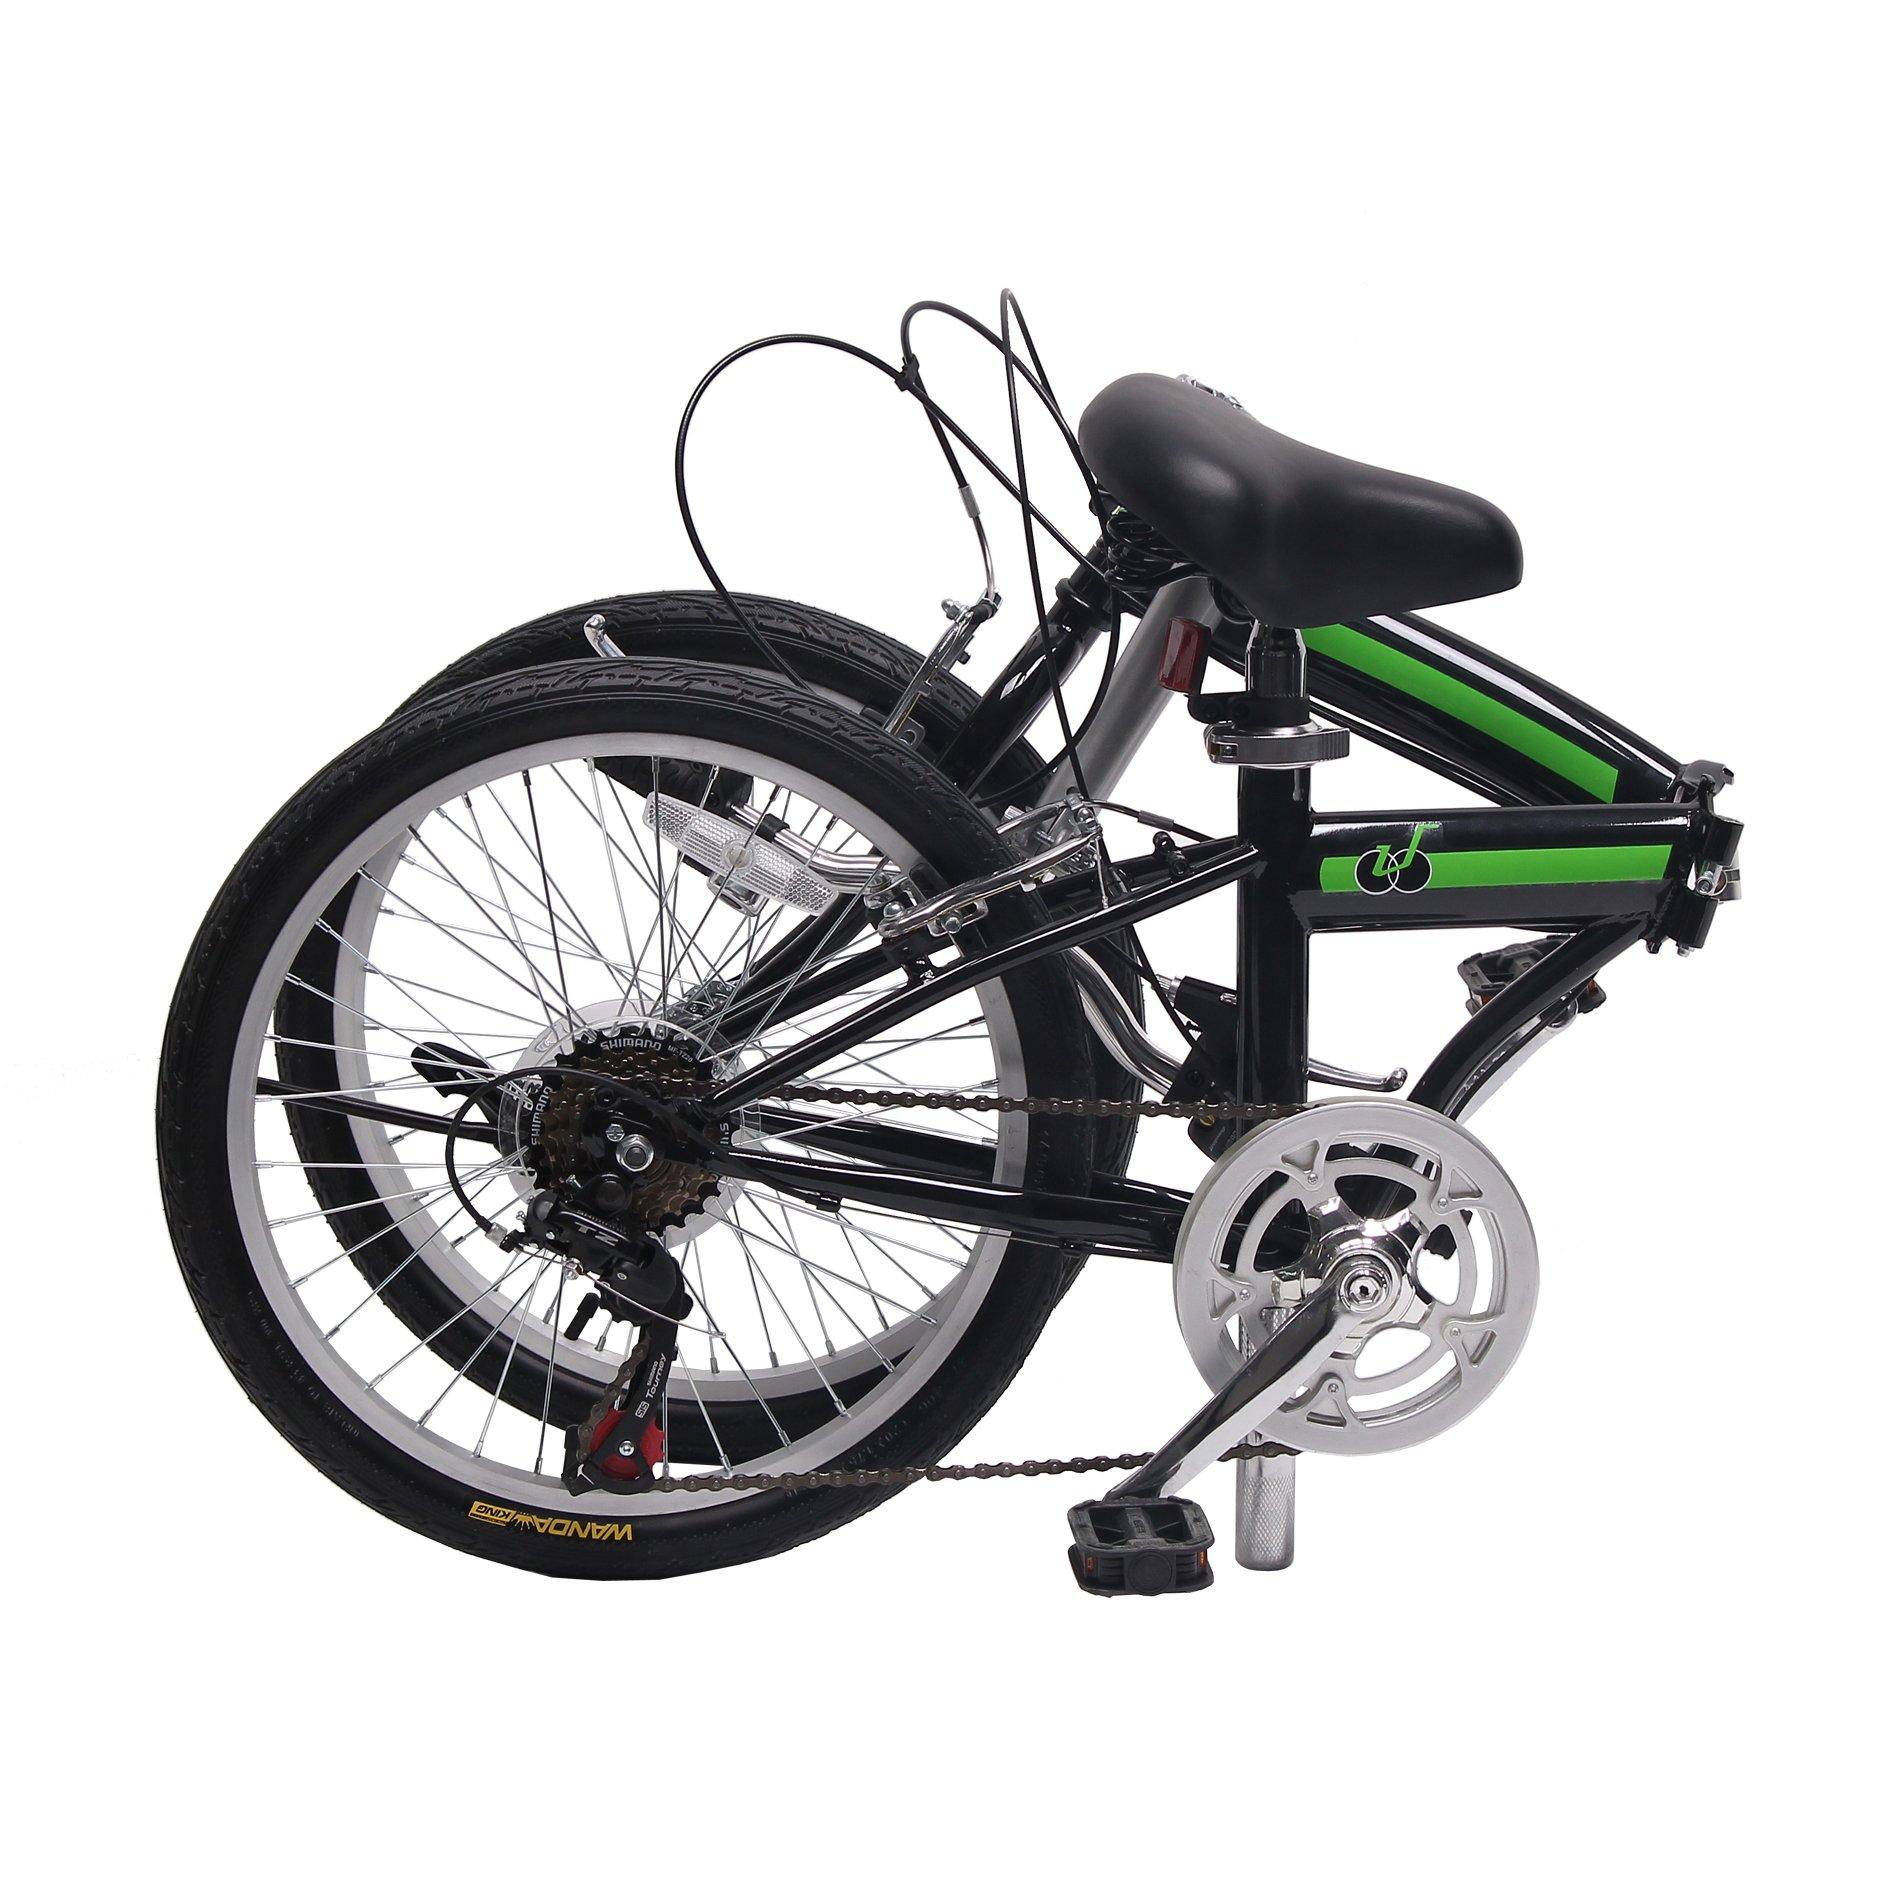 IDS Home Unyousual U Arc Folding City Bike Bicycle 6 Speed Steel Frame Shimano Gear Wanda Tire, Black by IDS Home (Image #2)